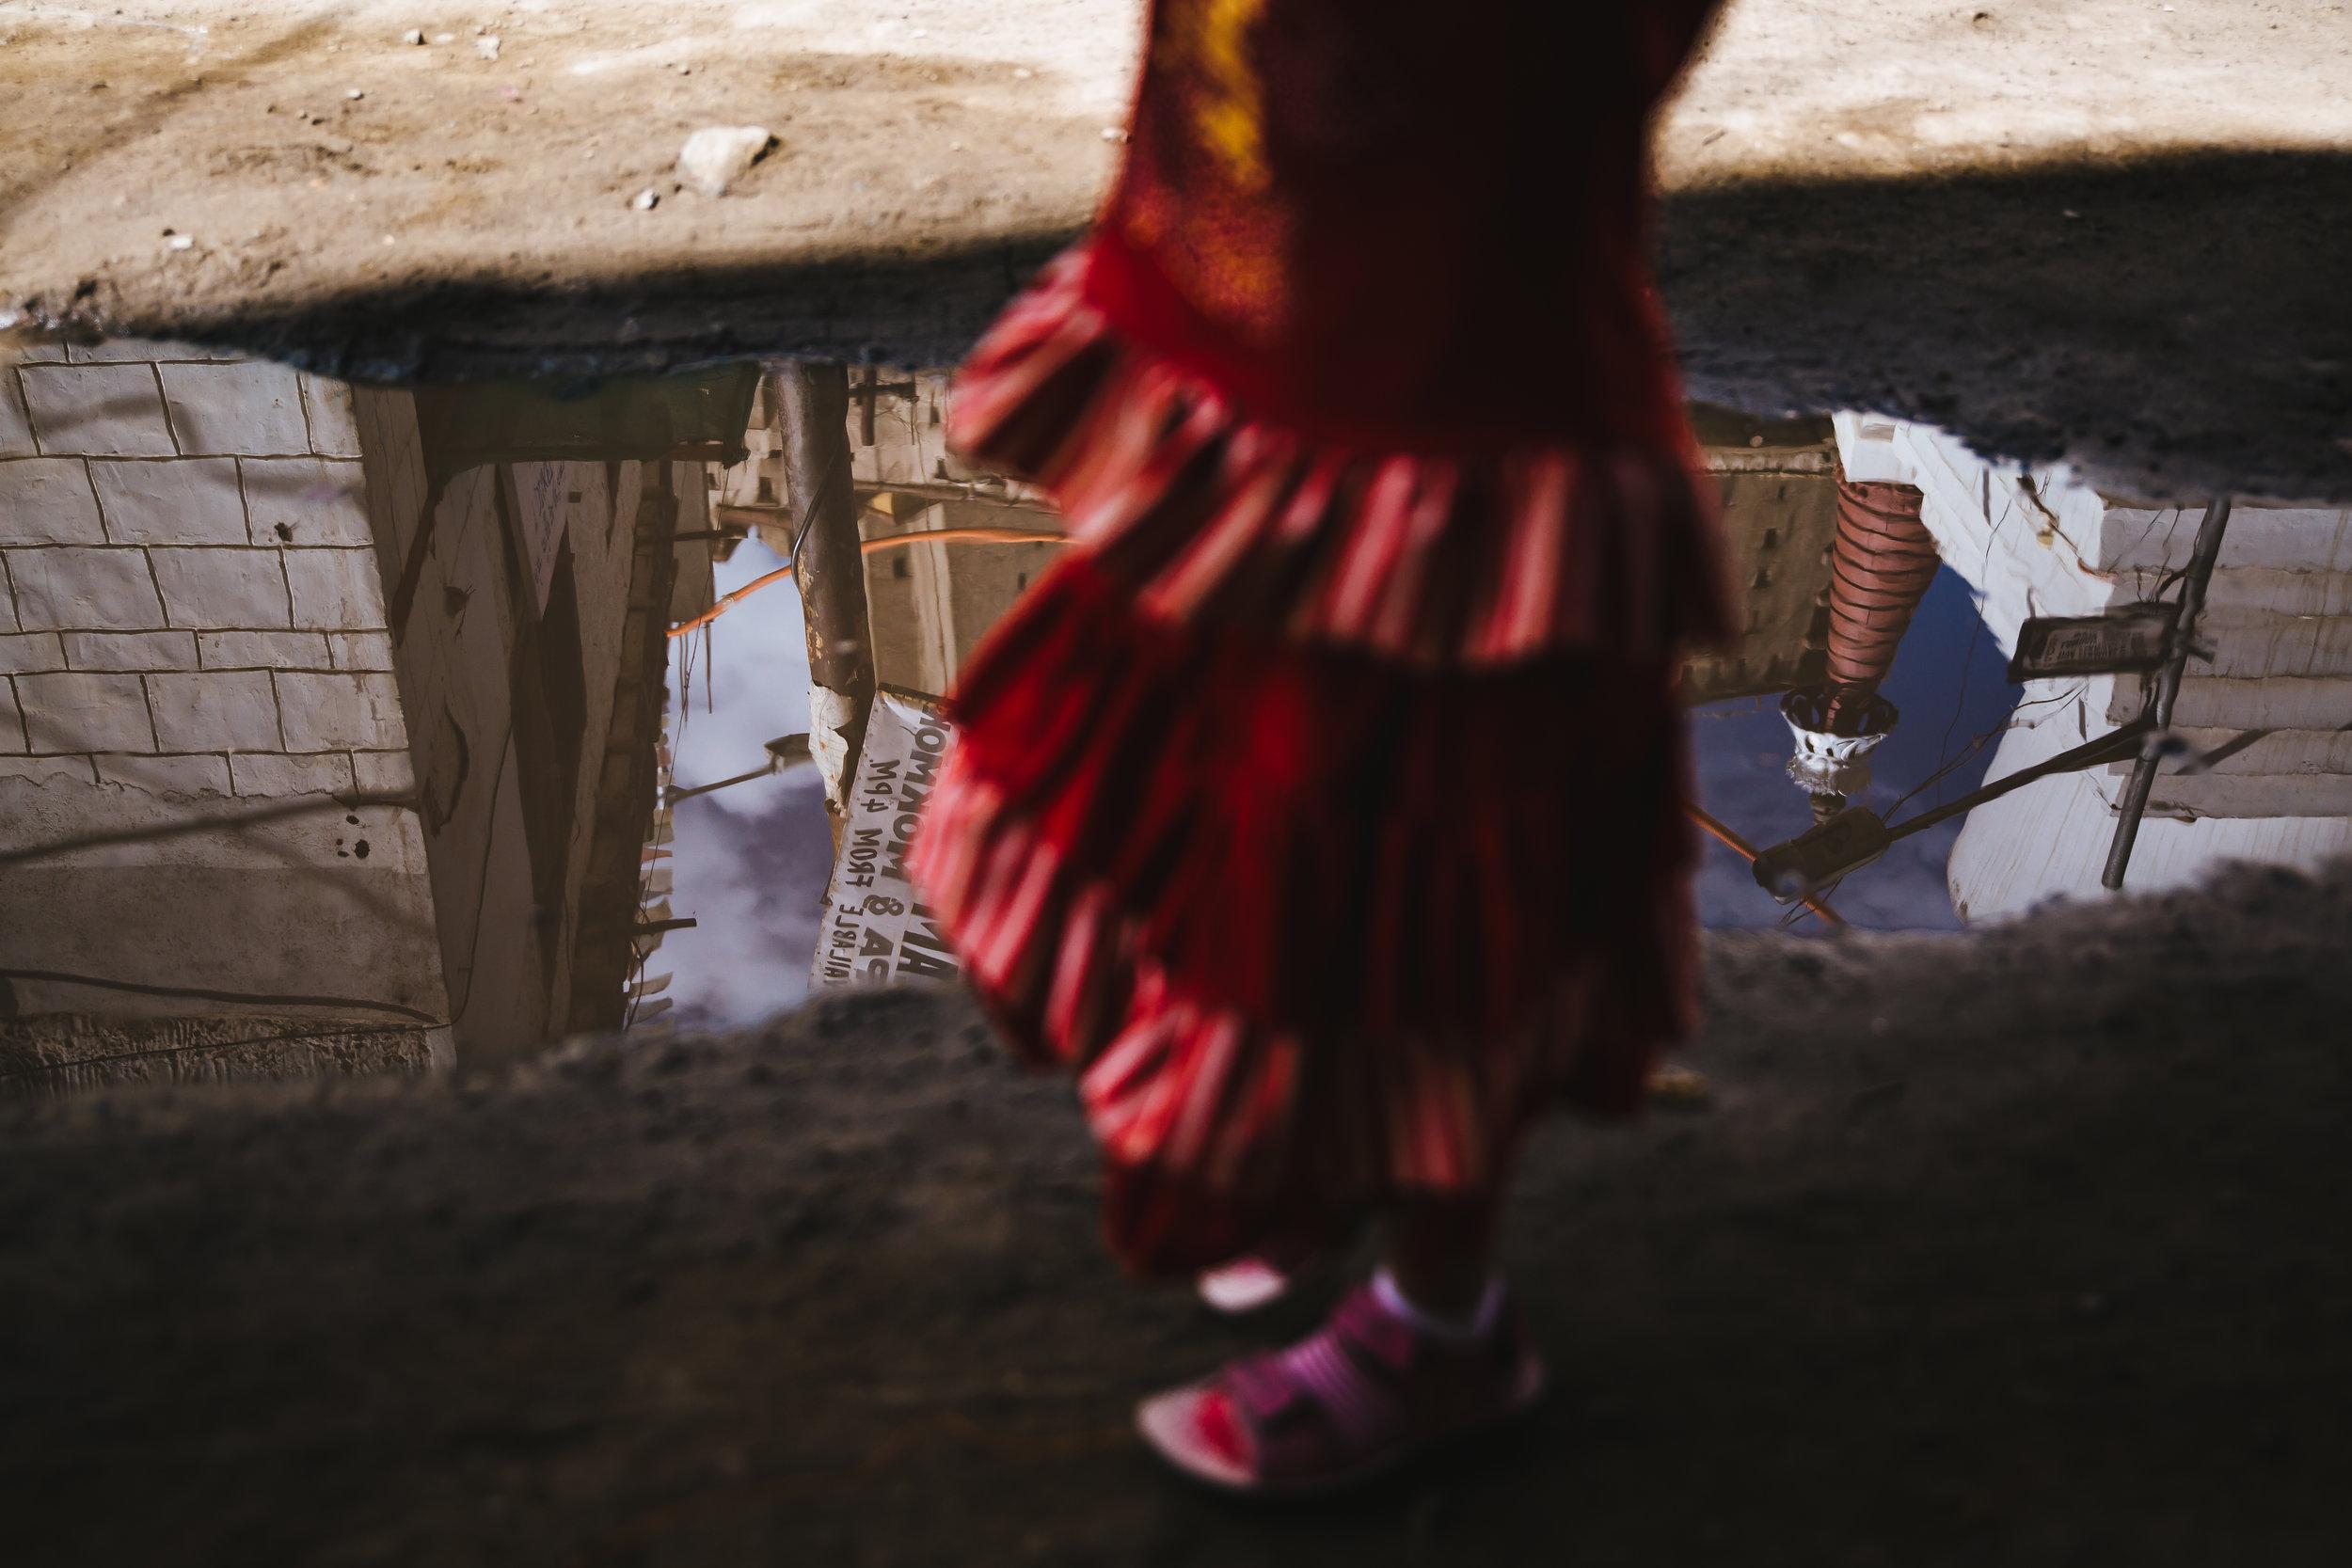 editorial-leh-girl-puddle